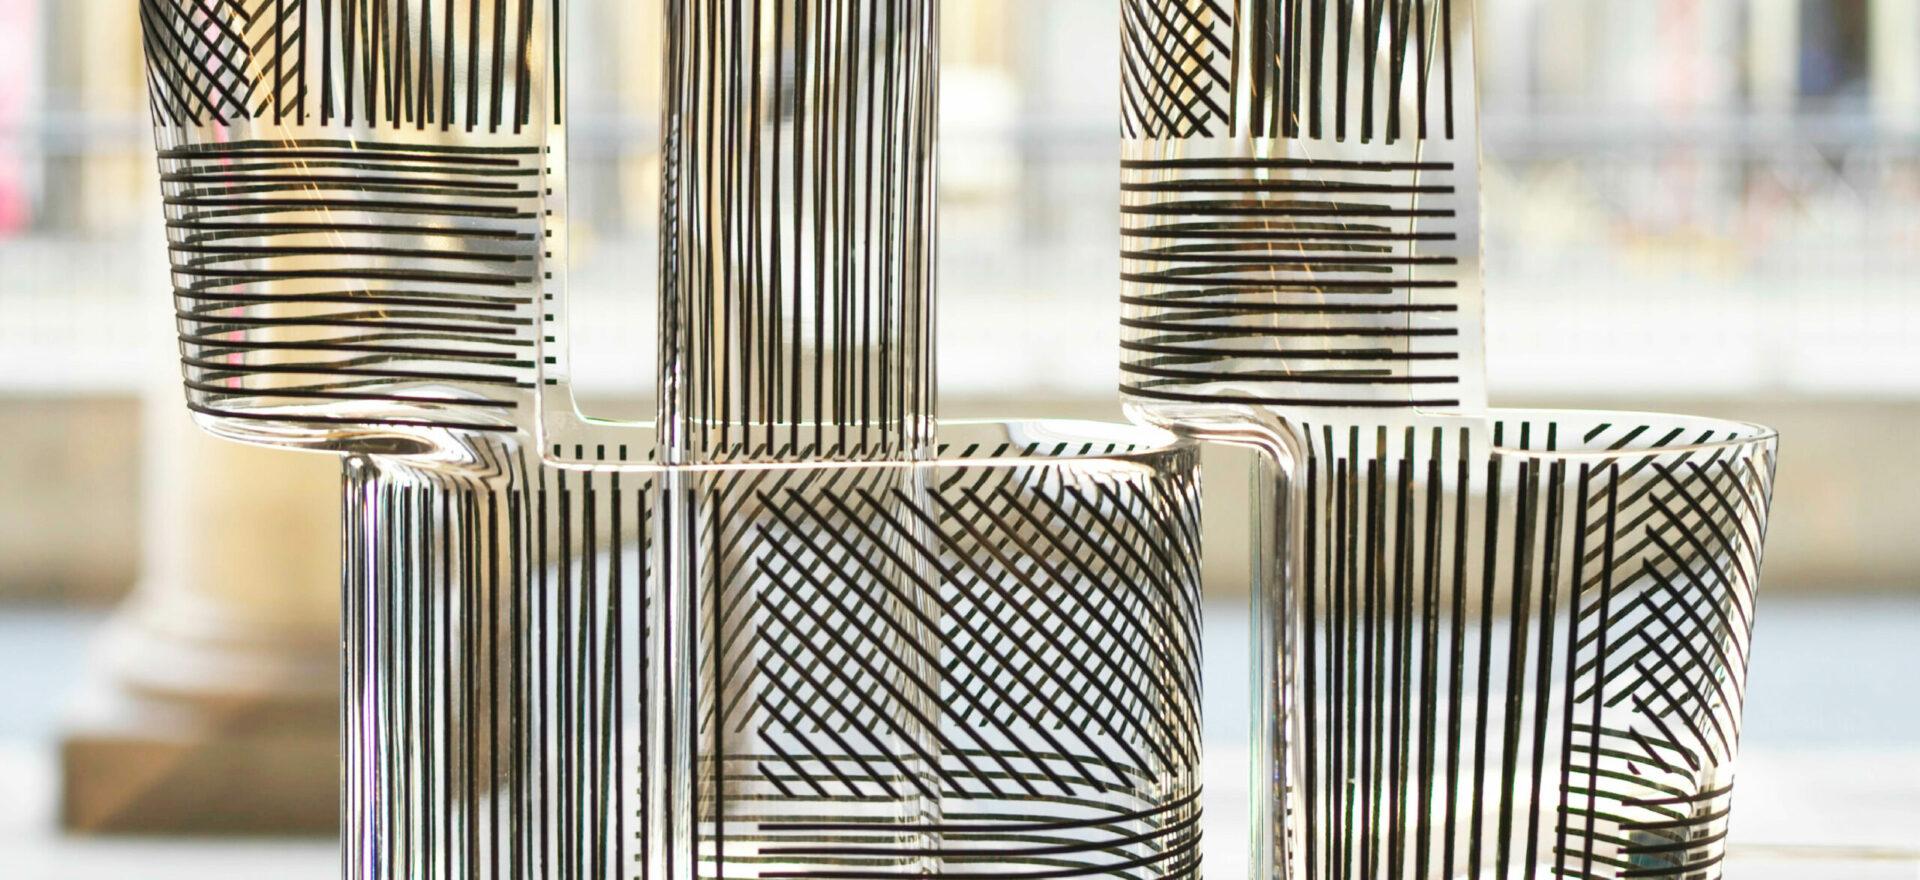 Water Tanks | Vases Collection | Product Design | Omnia | Paşabahçe | Mario Trimarchi Design